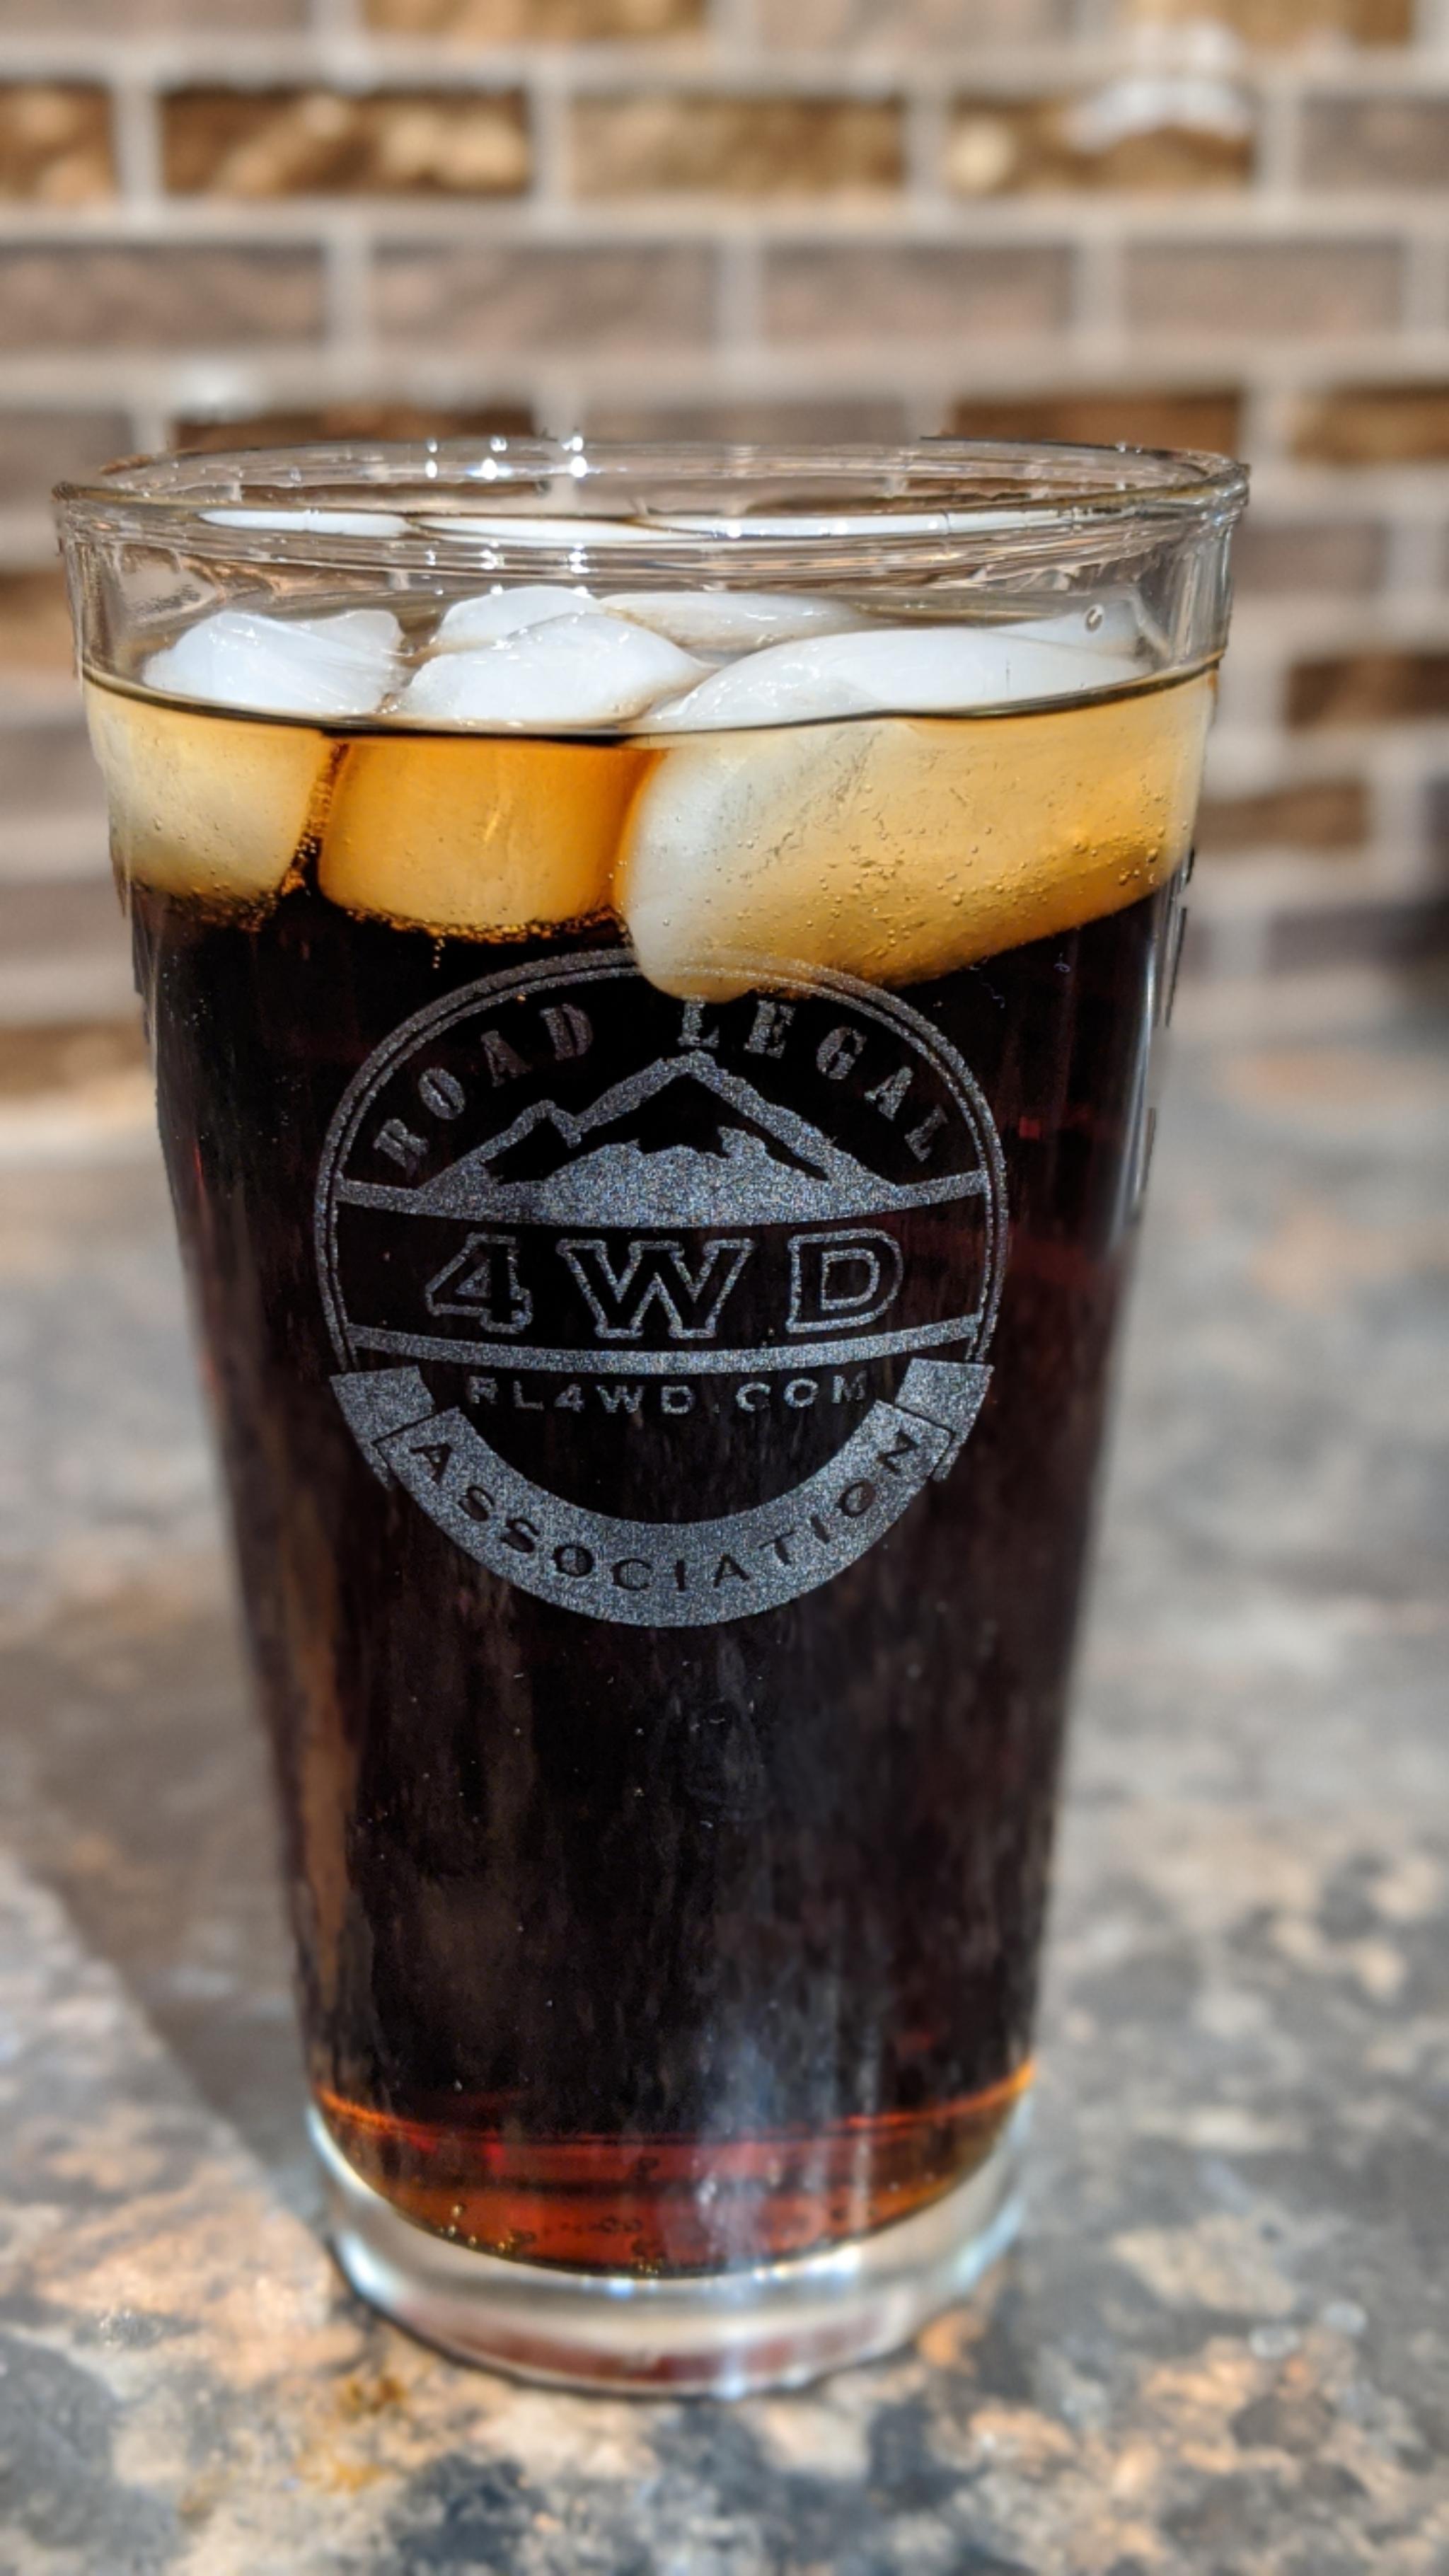 RL4WD Pint Glass